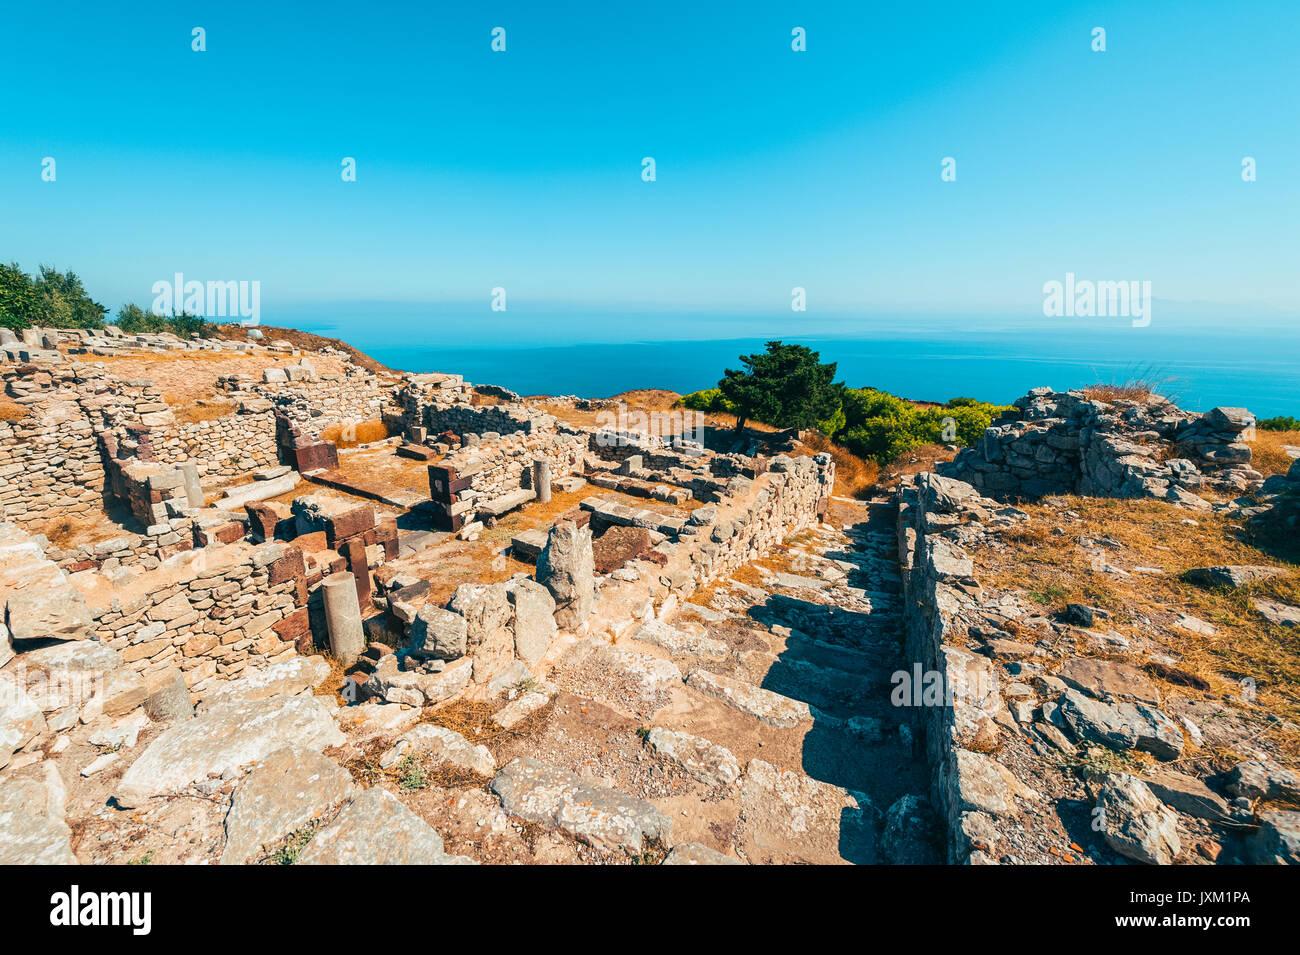 Ancient Thera historic site on Santorini Greece - Stock Image